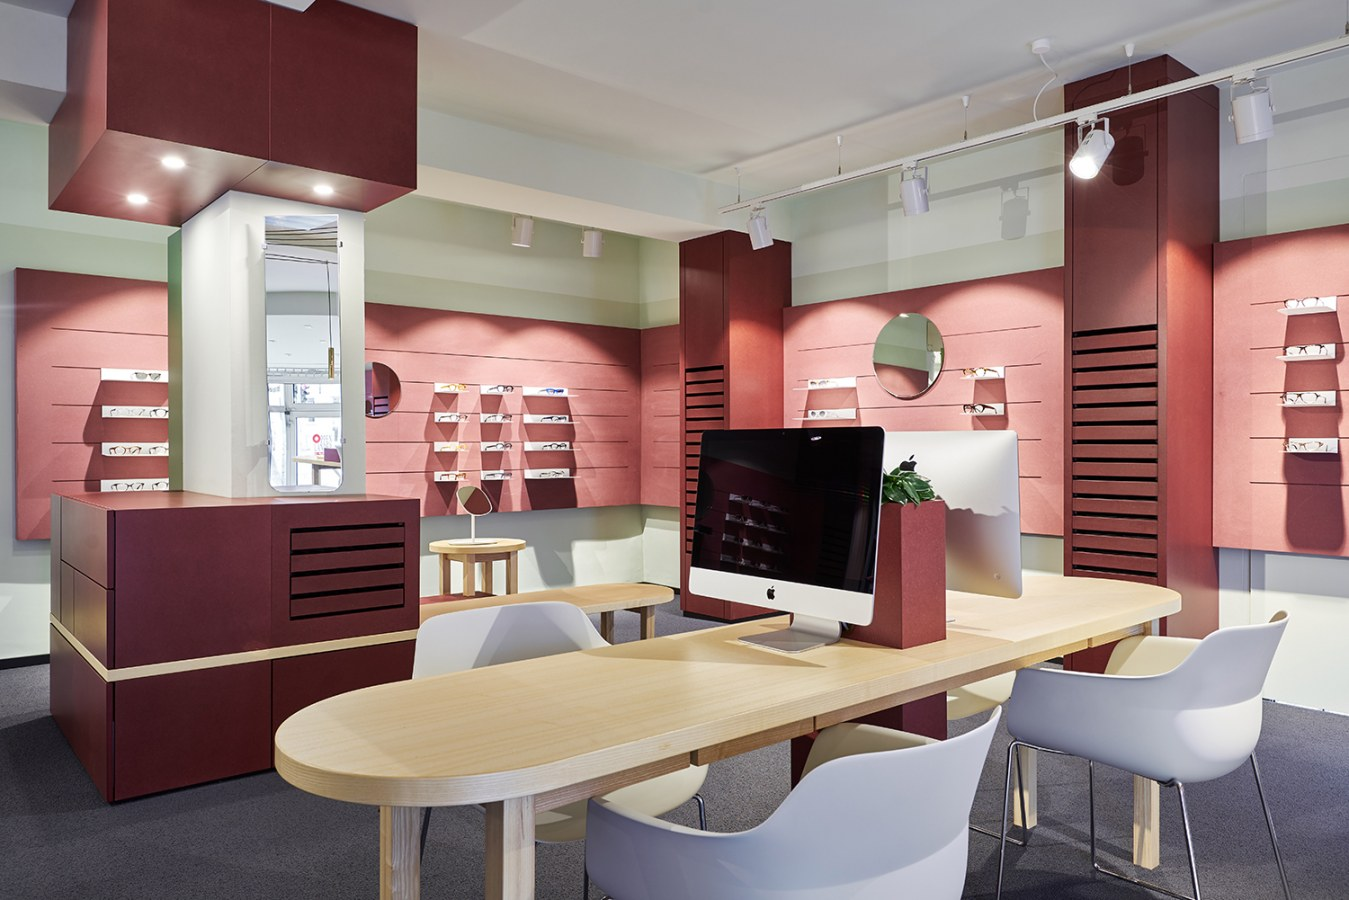 Isabell-Ehring-Innenarchitektur-Stuttgart---Umbau Ladenfläche-OPPENLÄNDEROPTIK-19.jpg